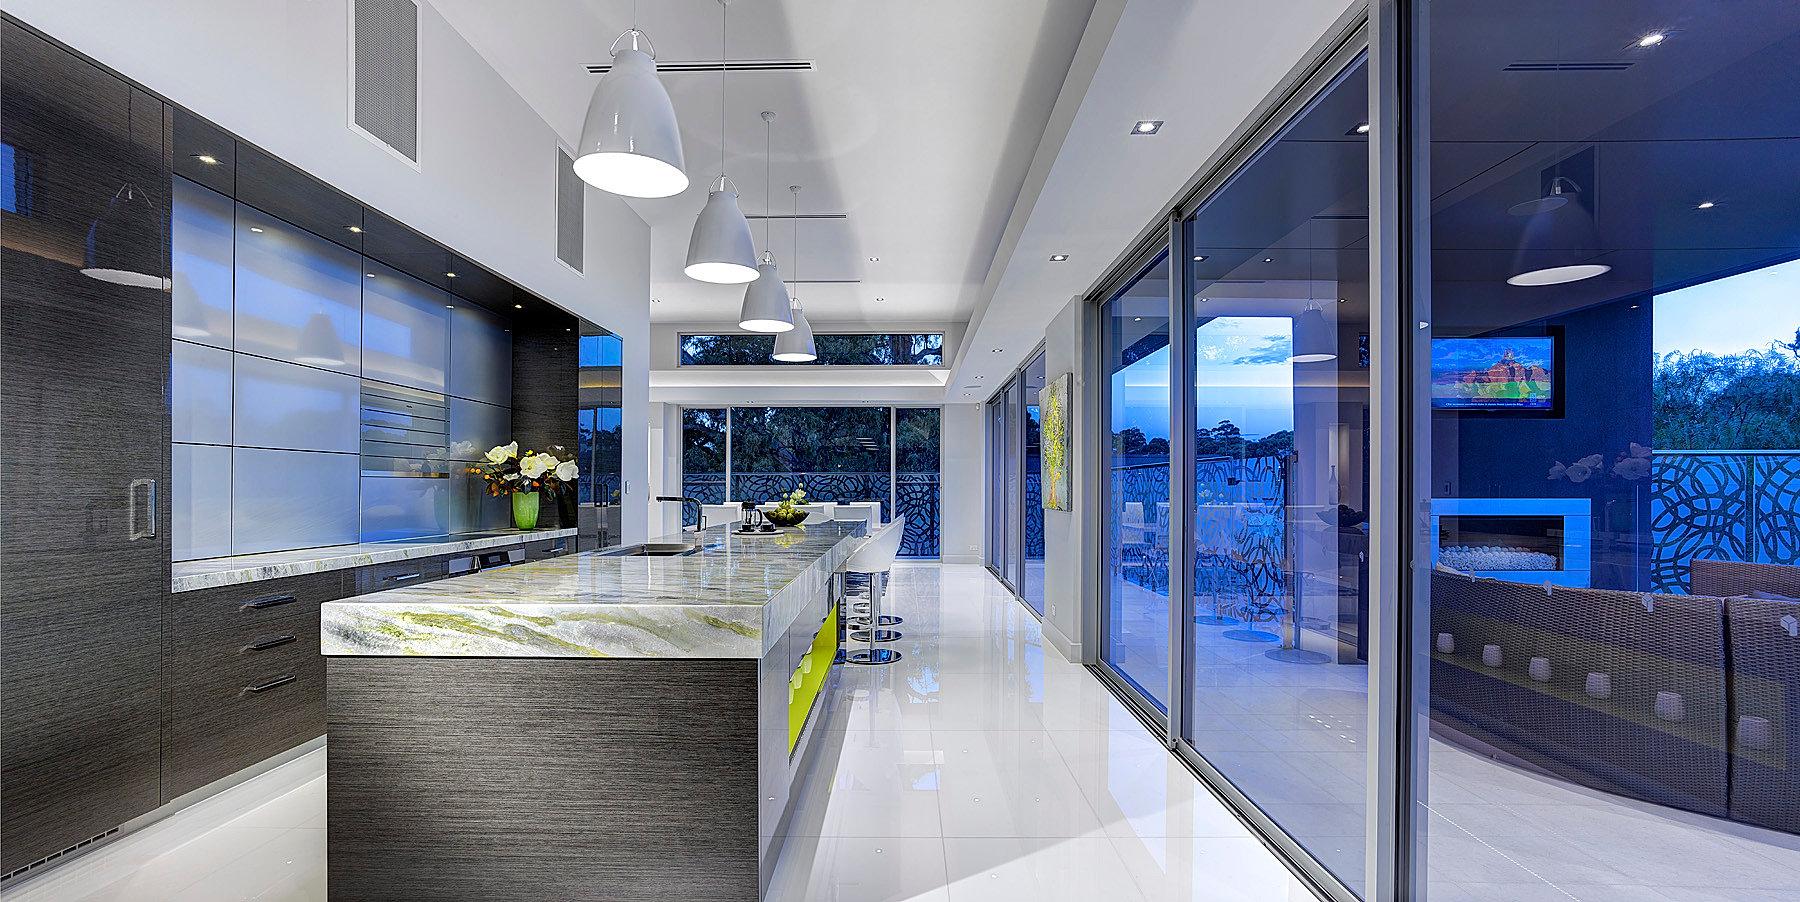 Infinity Kitchen Designs Tma Kitchen Design Tony Warren From Adelaide South Australia